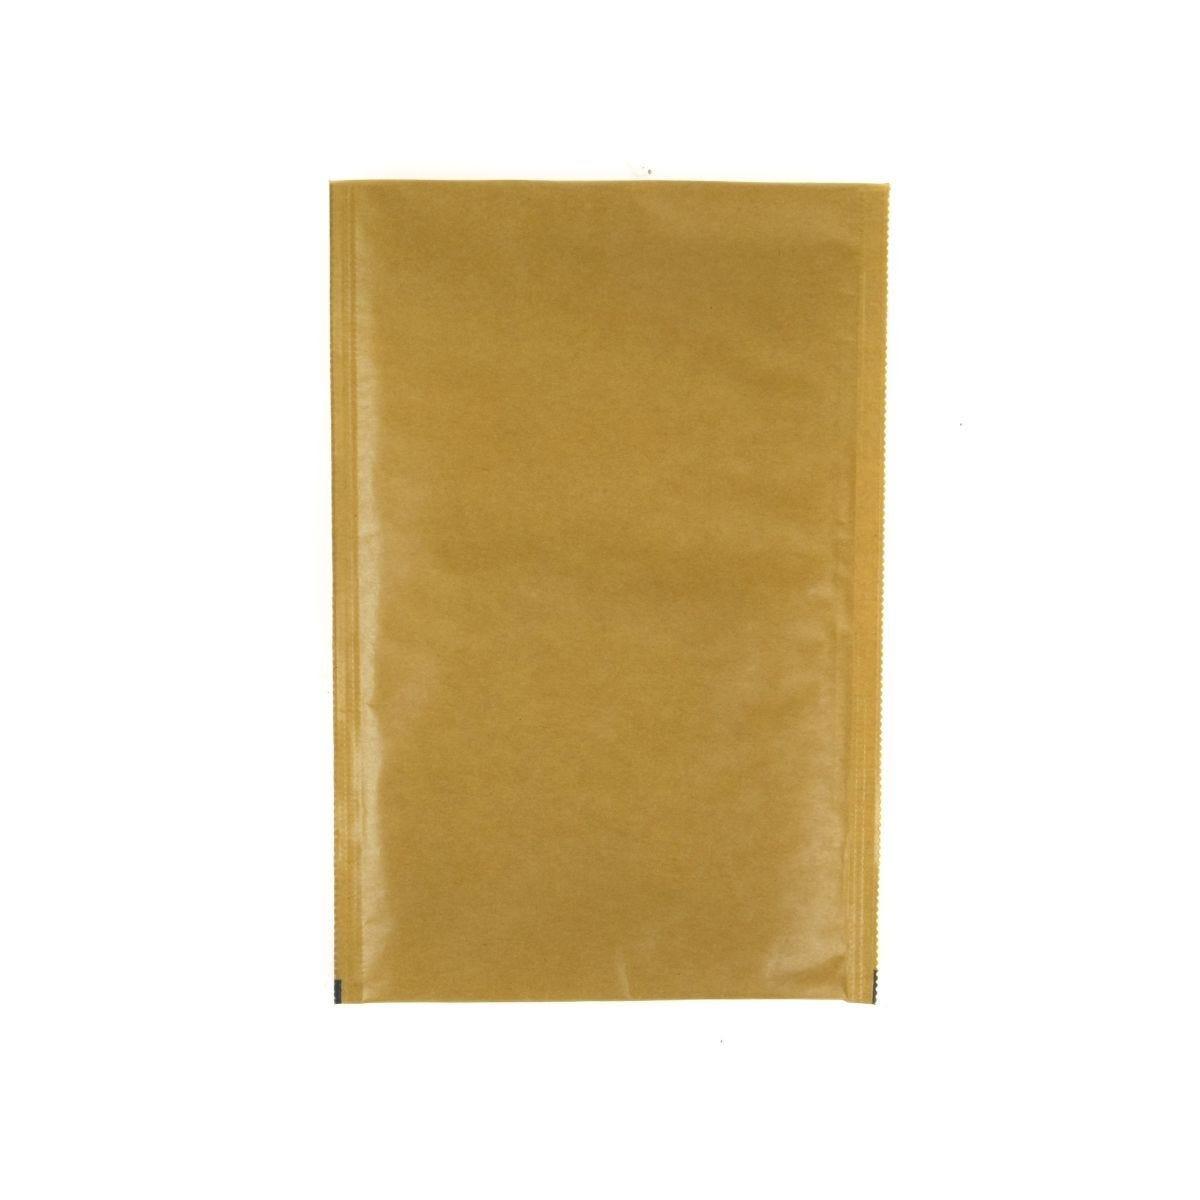 Jiffy Bubble Envelope B/00 120x210mm Peel and Seal